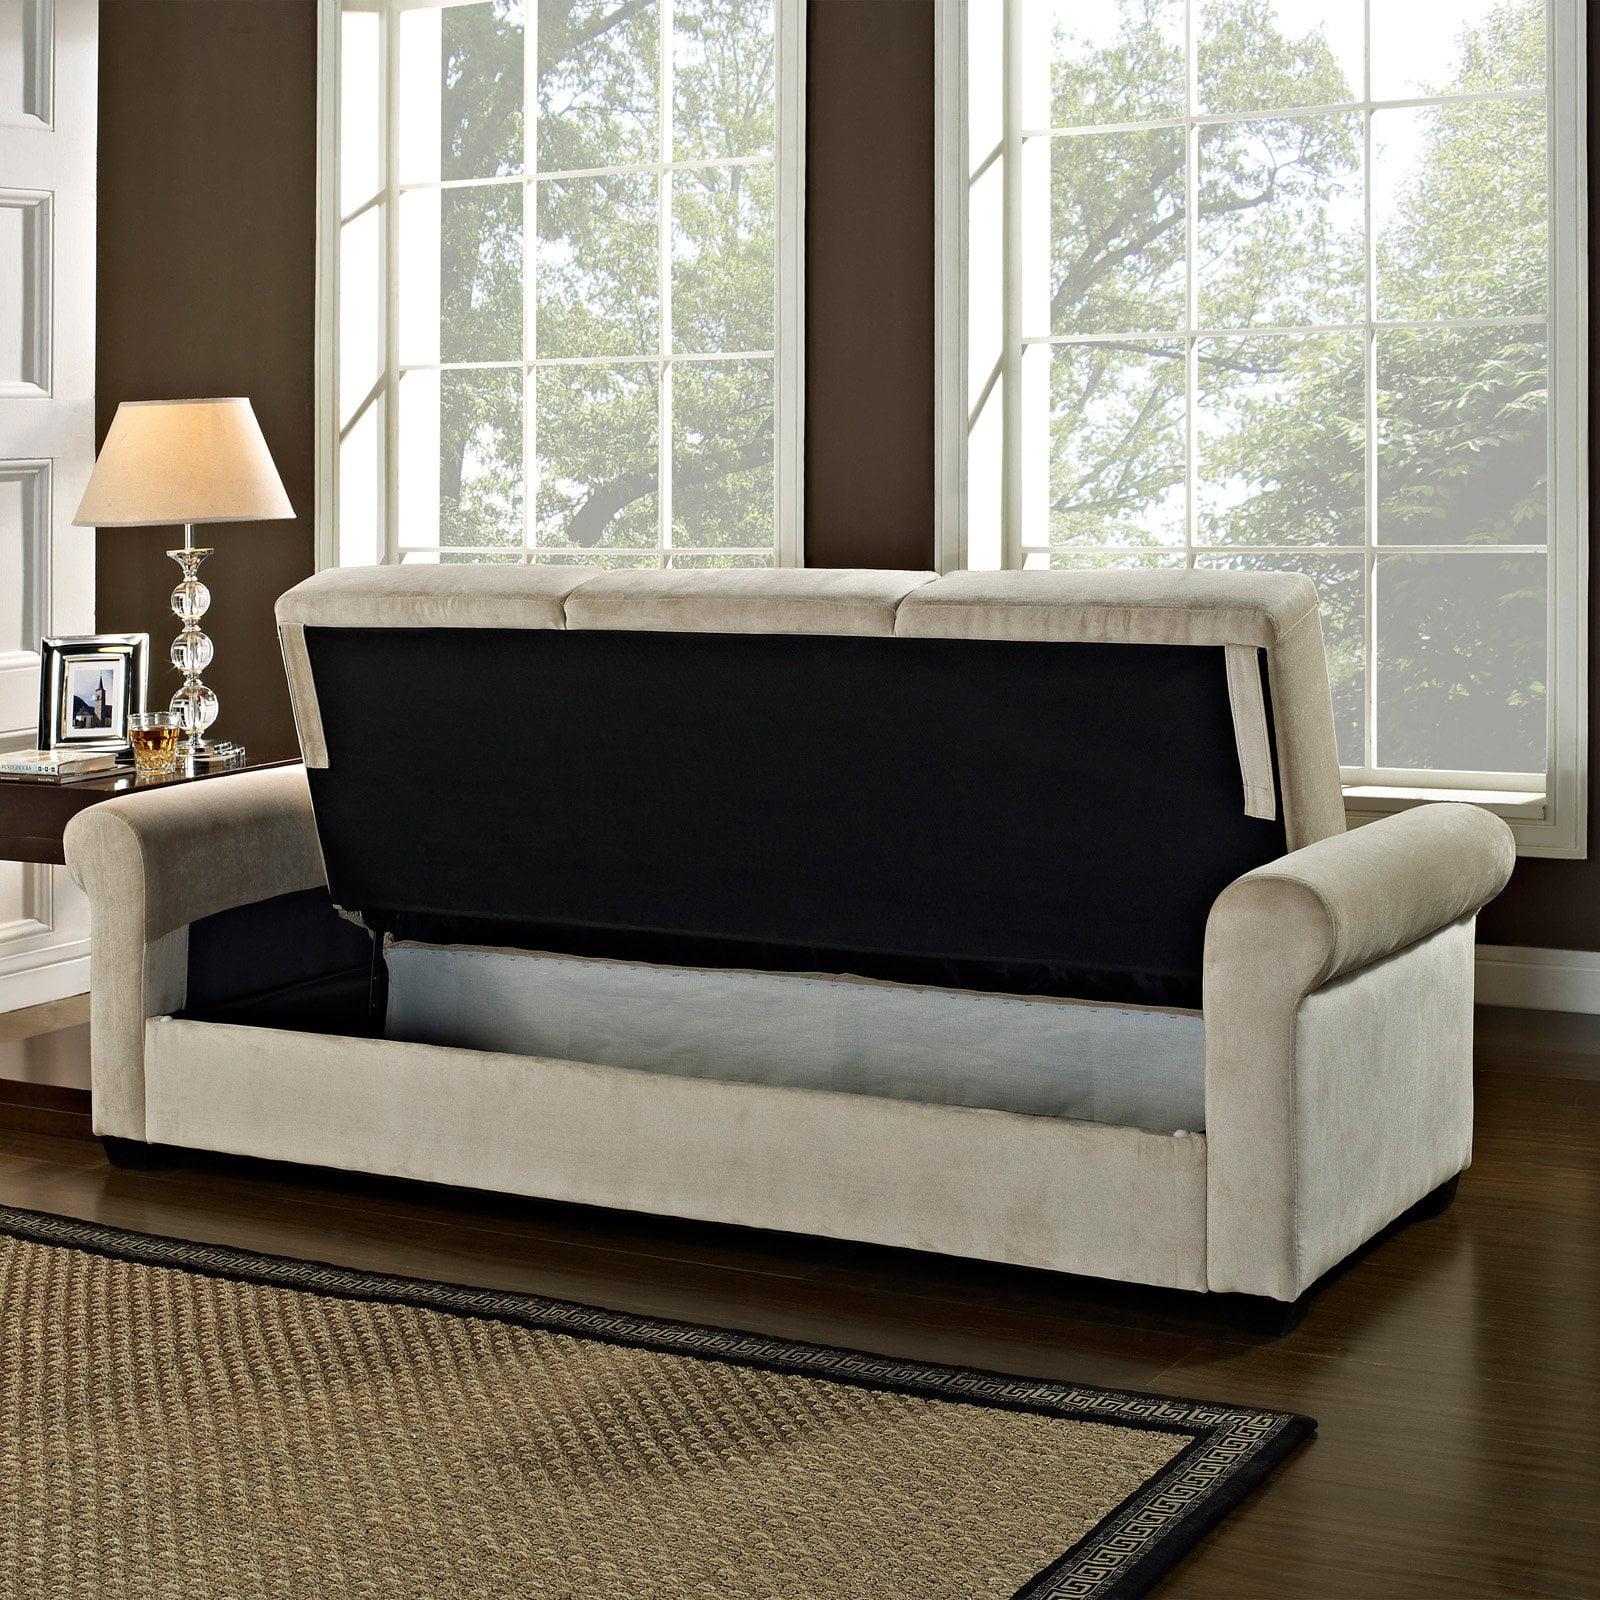 convertible sofa with storage – Home Decor 88